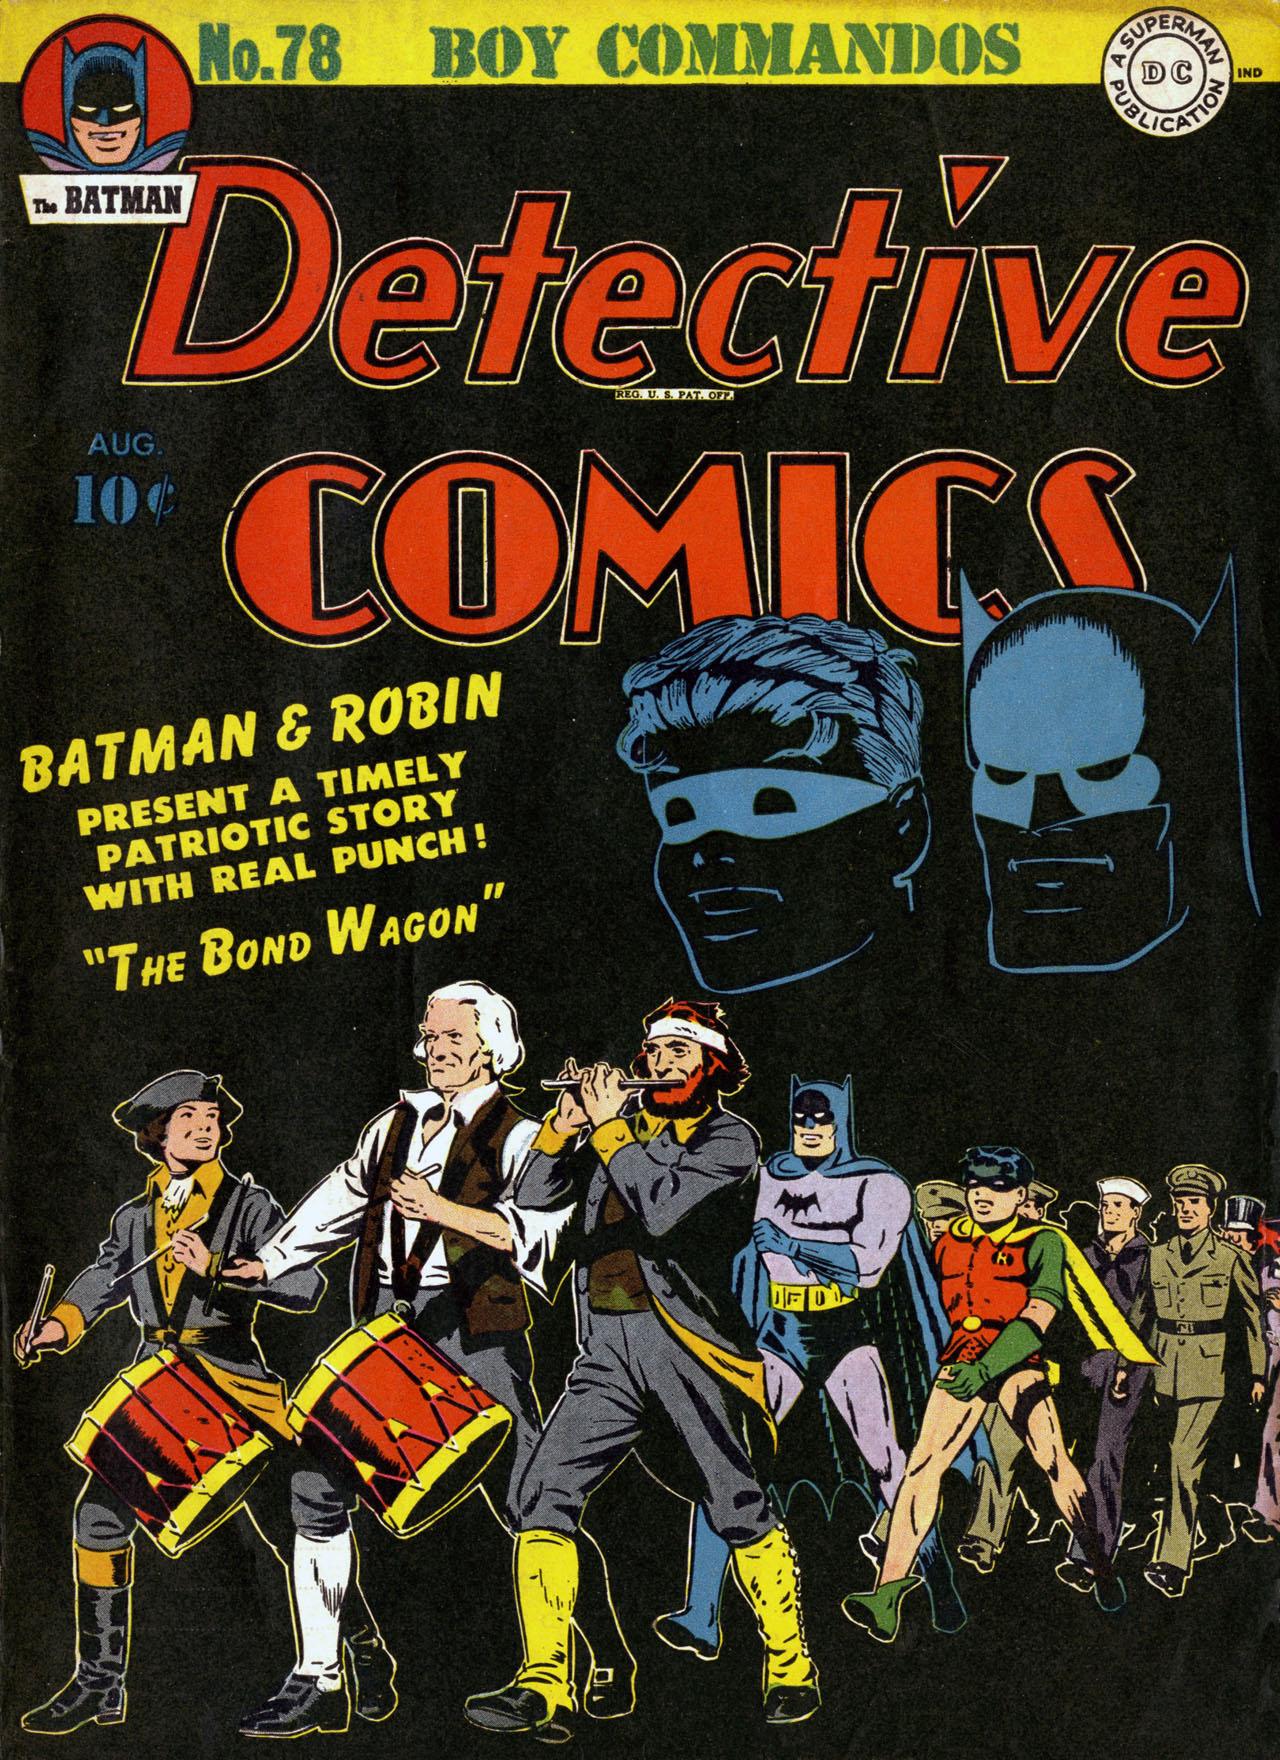 Read online Detective Comics (1937) comic -  Issue #78 - 1